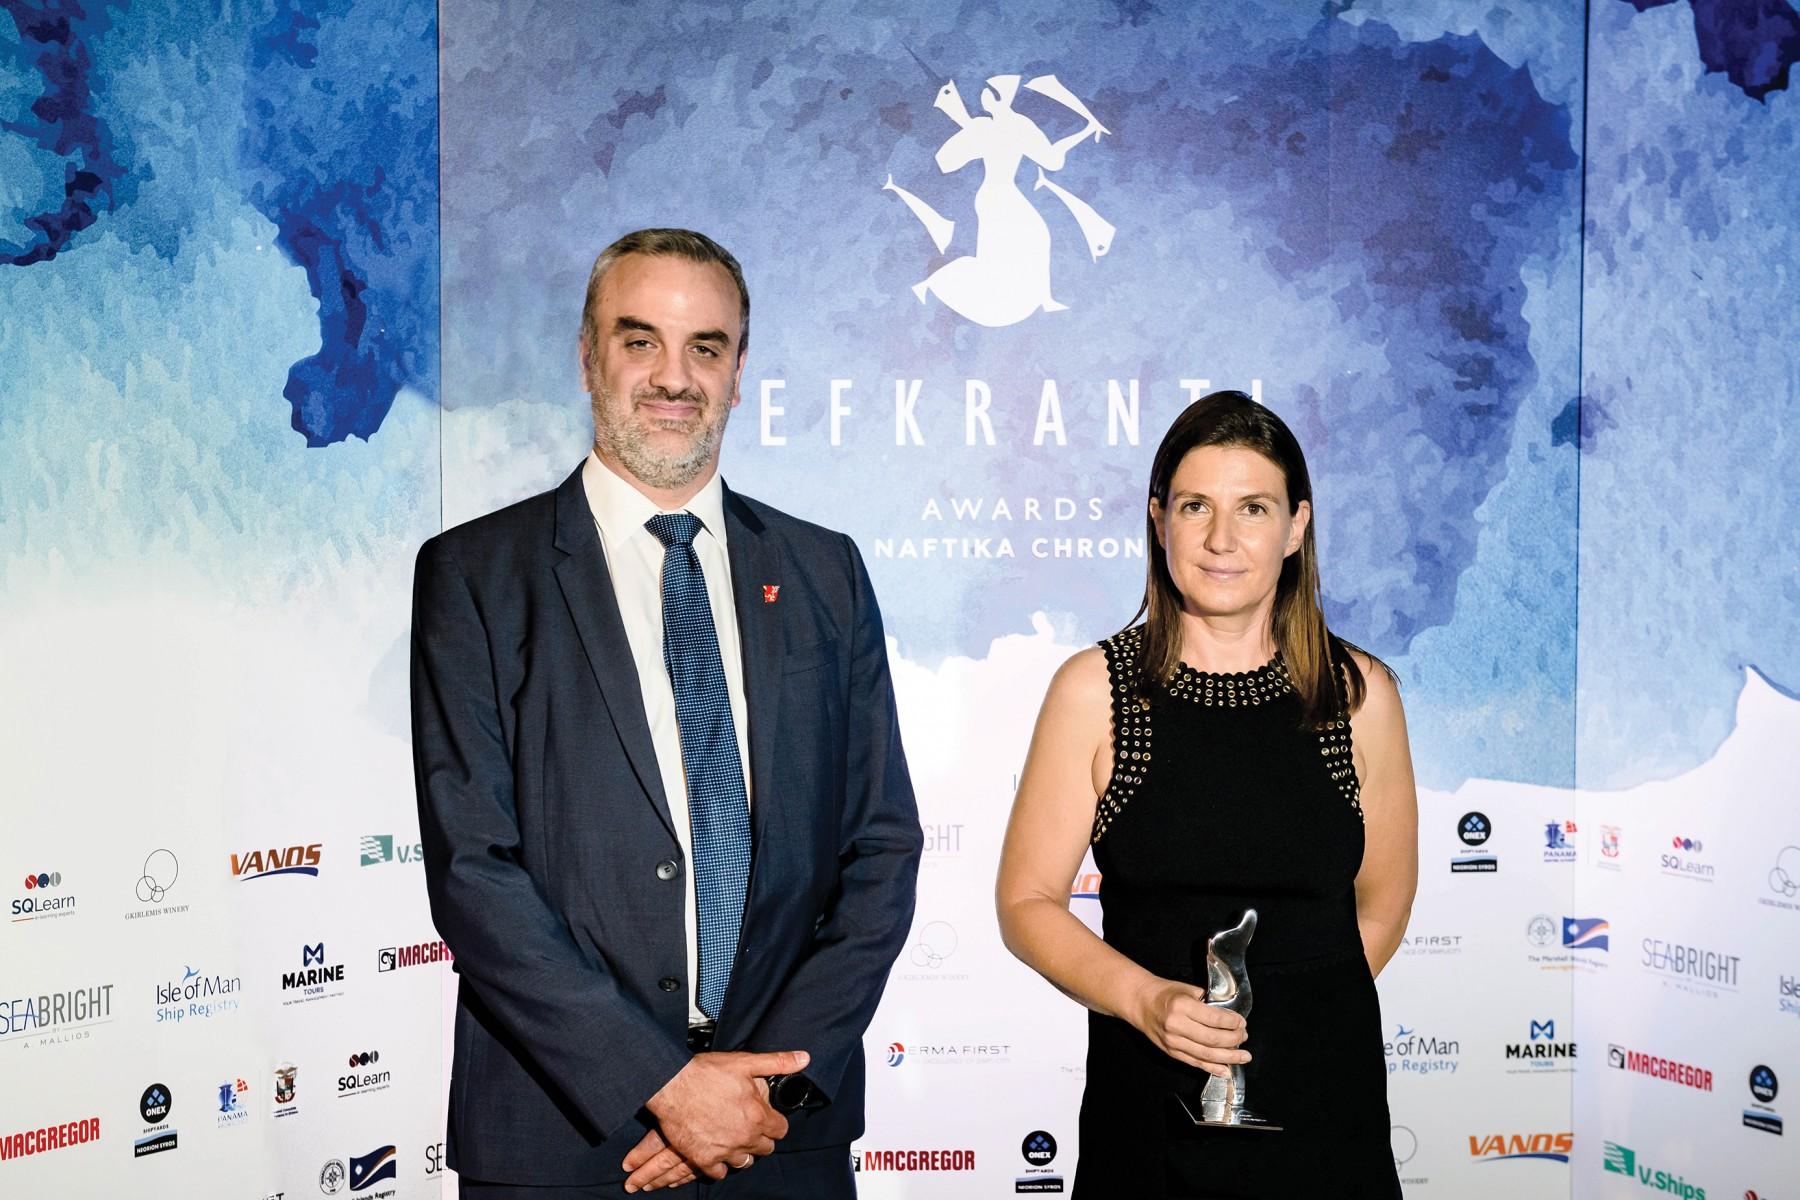 H κ. Ιωάννα Προκοπίου παραλαμβάνει το αγαλματίδιο «Ευκράντη» από τον κ. Κωνσταντίνο Μαχαίρα, Business Development Manager (Greece) του νηολογίου Isle of Man